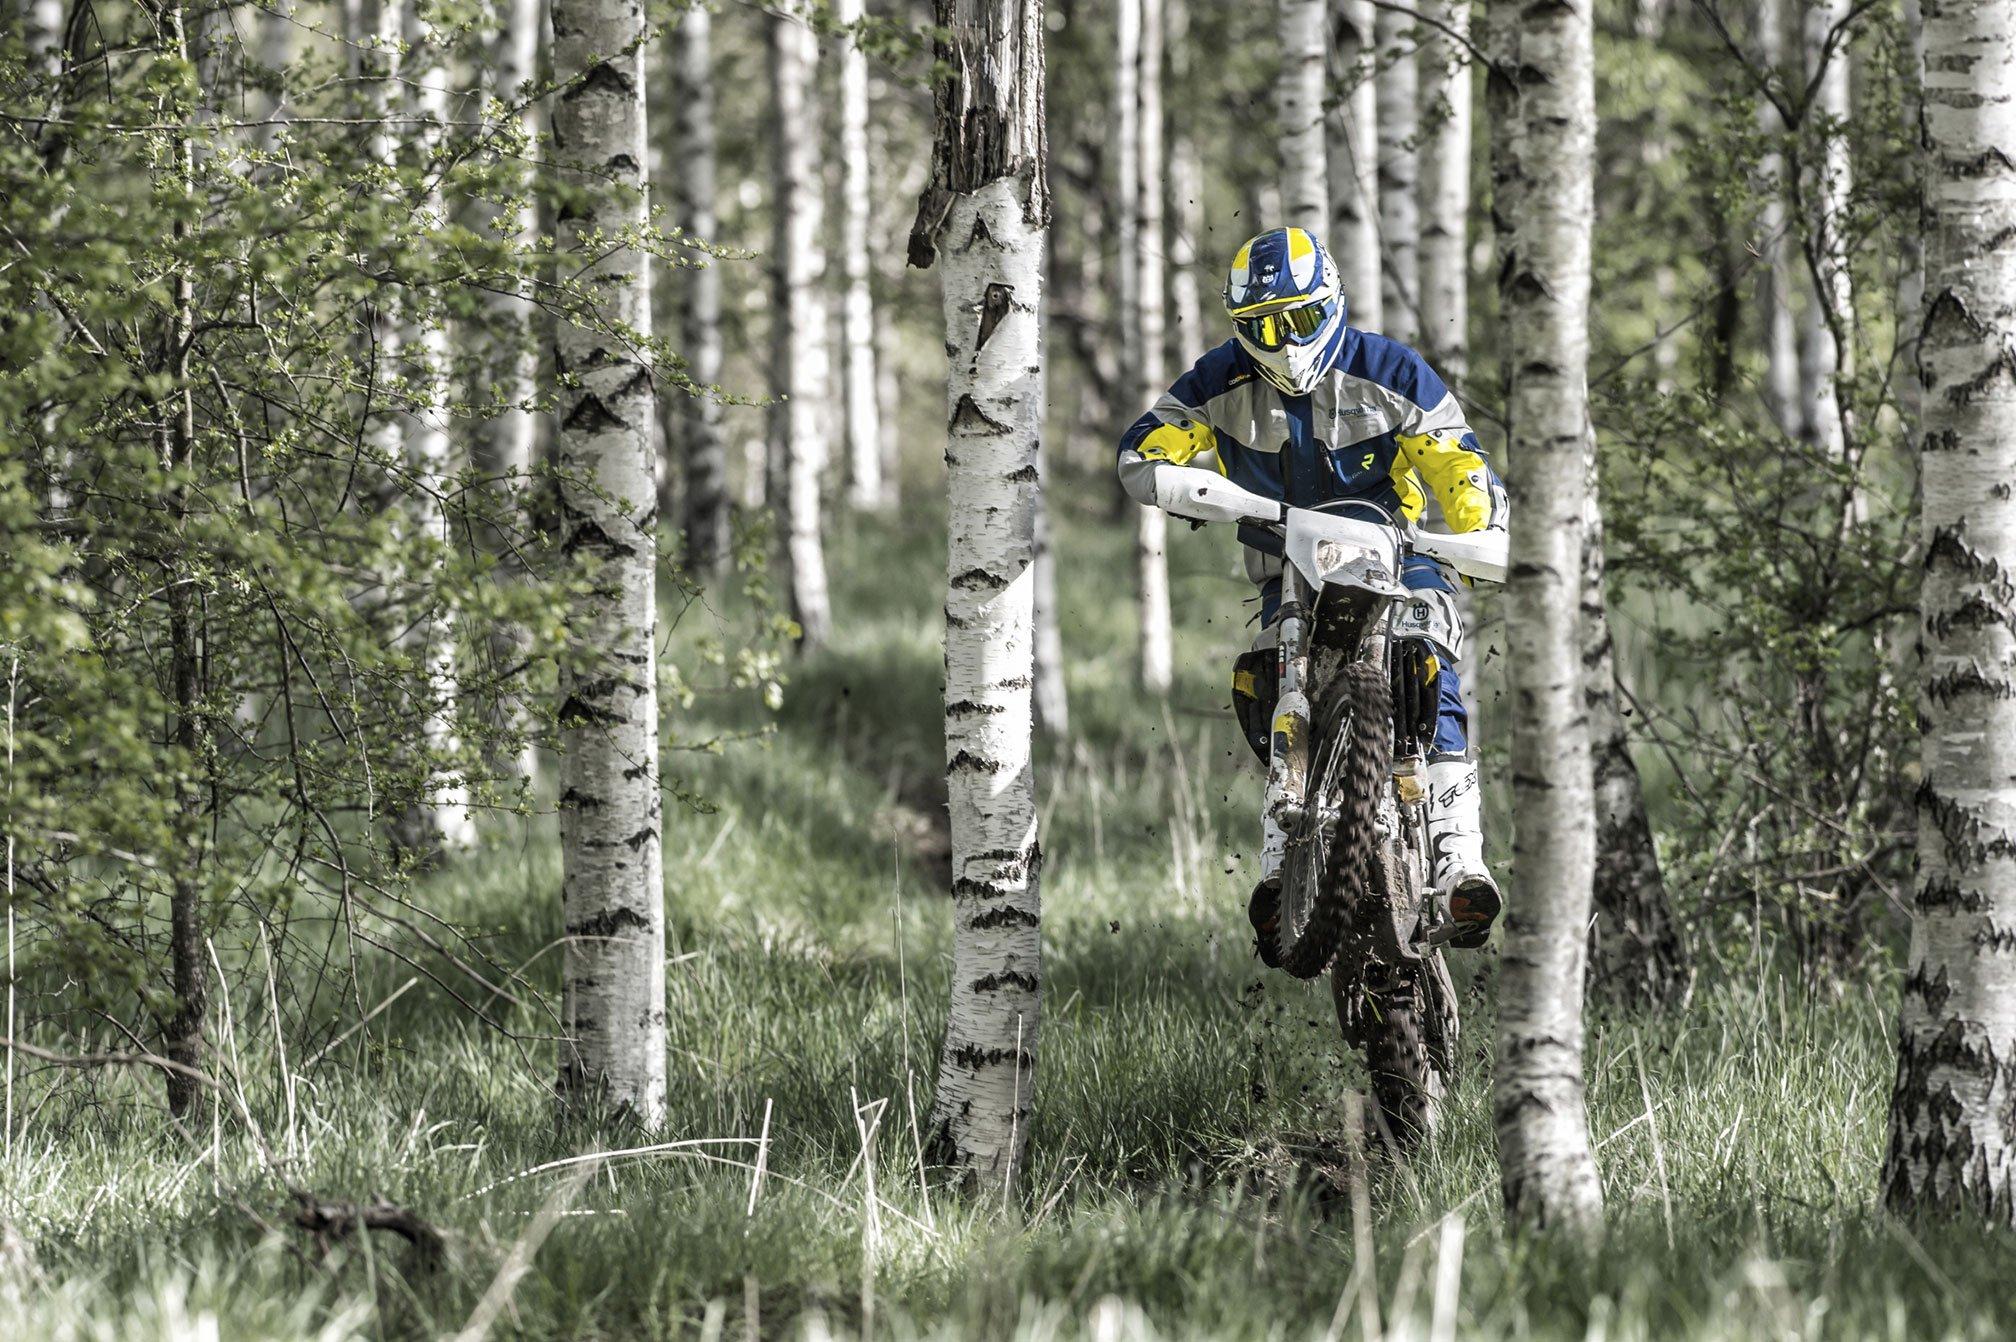 2016 Husqvarna FE501 Enduro Moto Motocross Dirtbike Bike